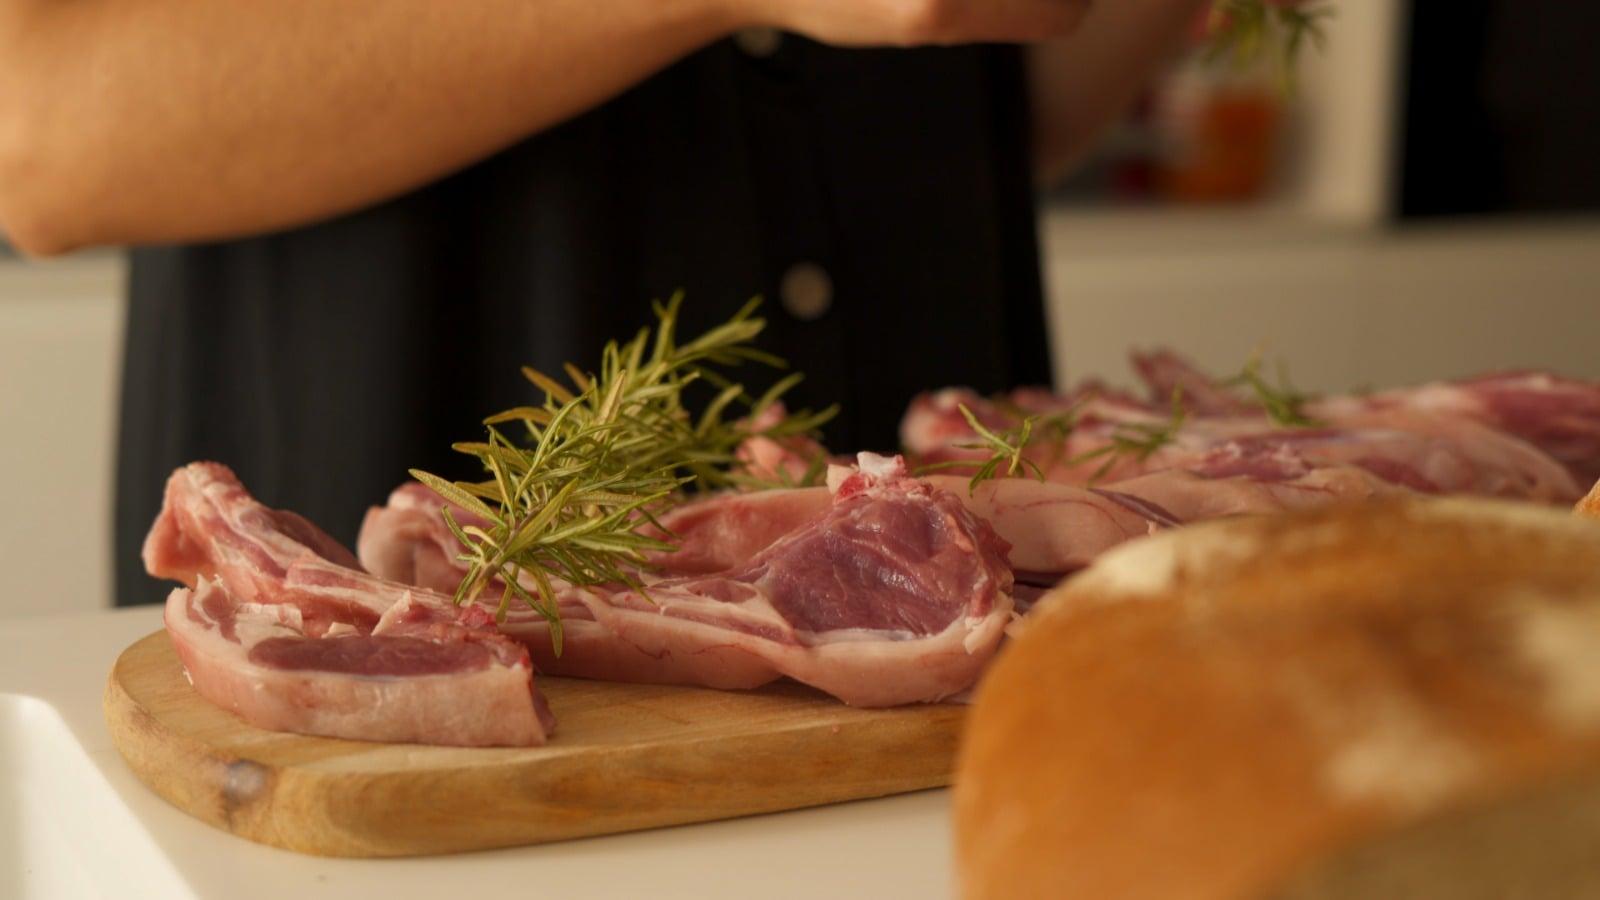 Carn fresca | Facebook Anafric